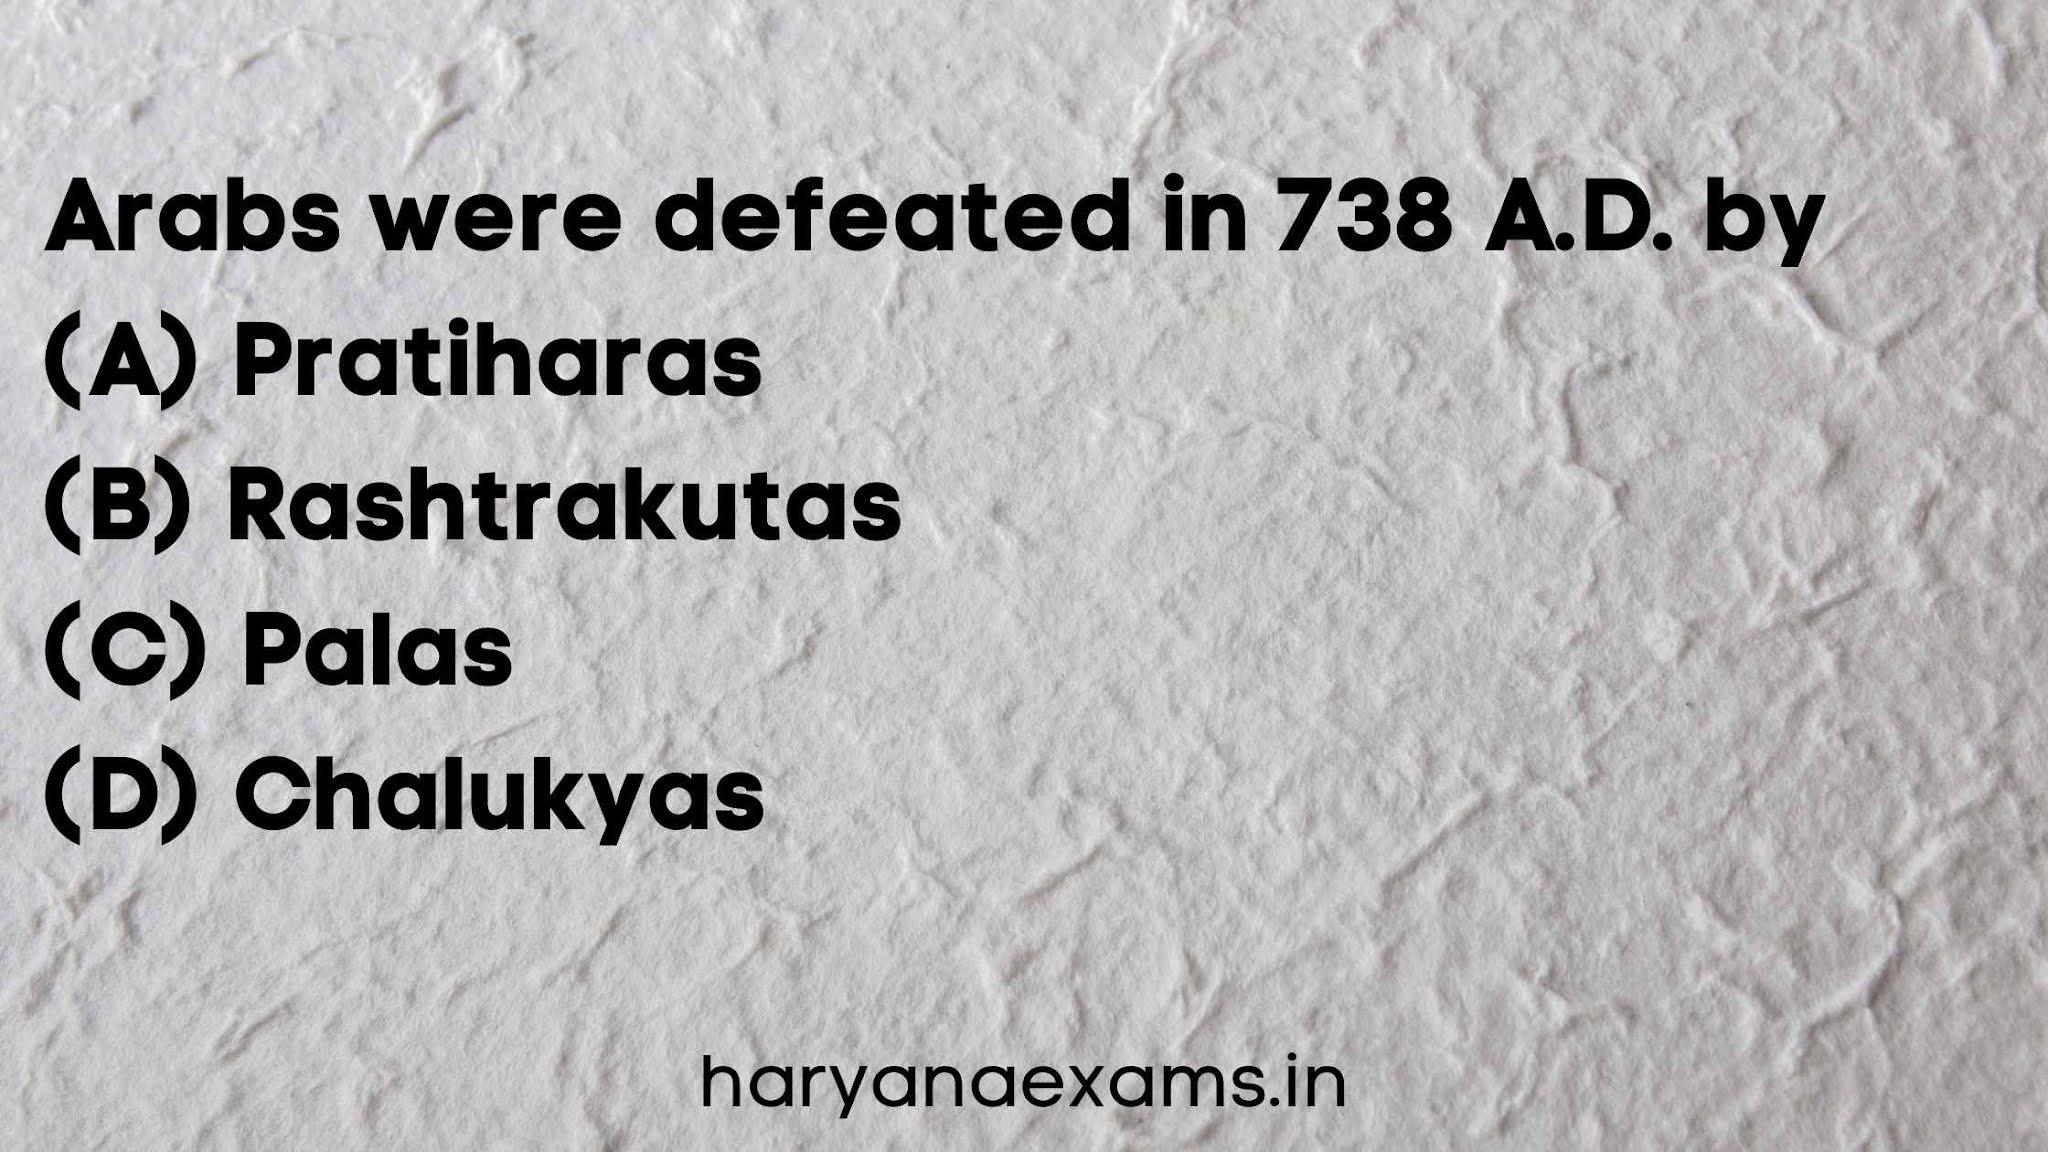 Arabs were defeated in 738 A.D. by   (A) Pratiharas   (B) Rashtrakutas   (C) Palas   (D) Chalukyas